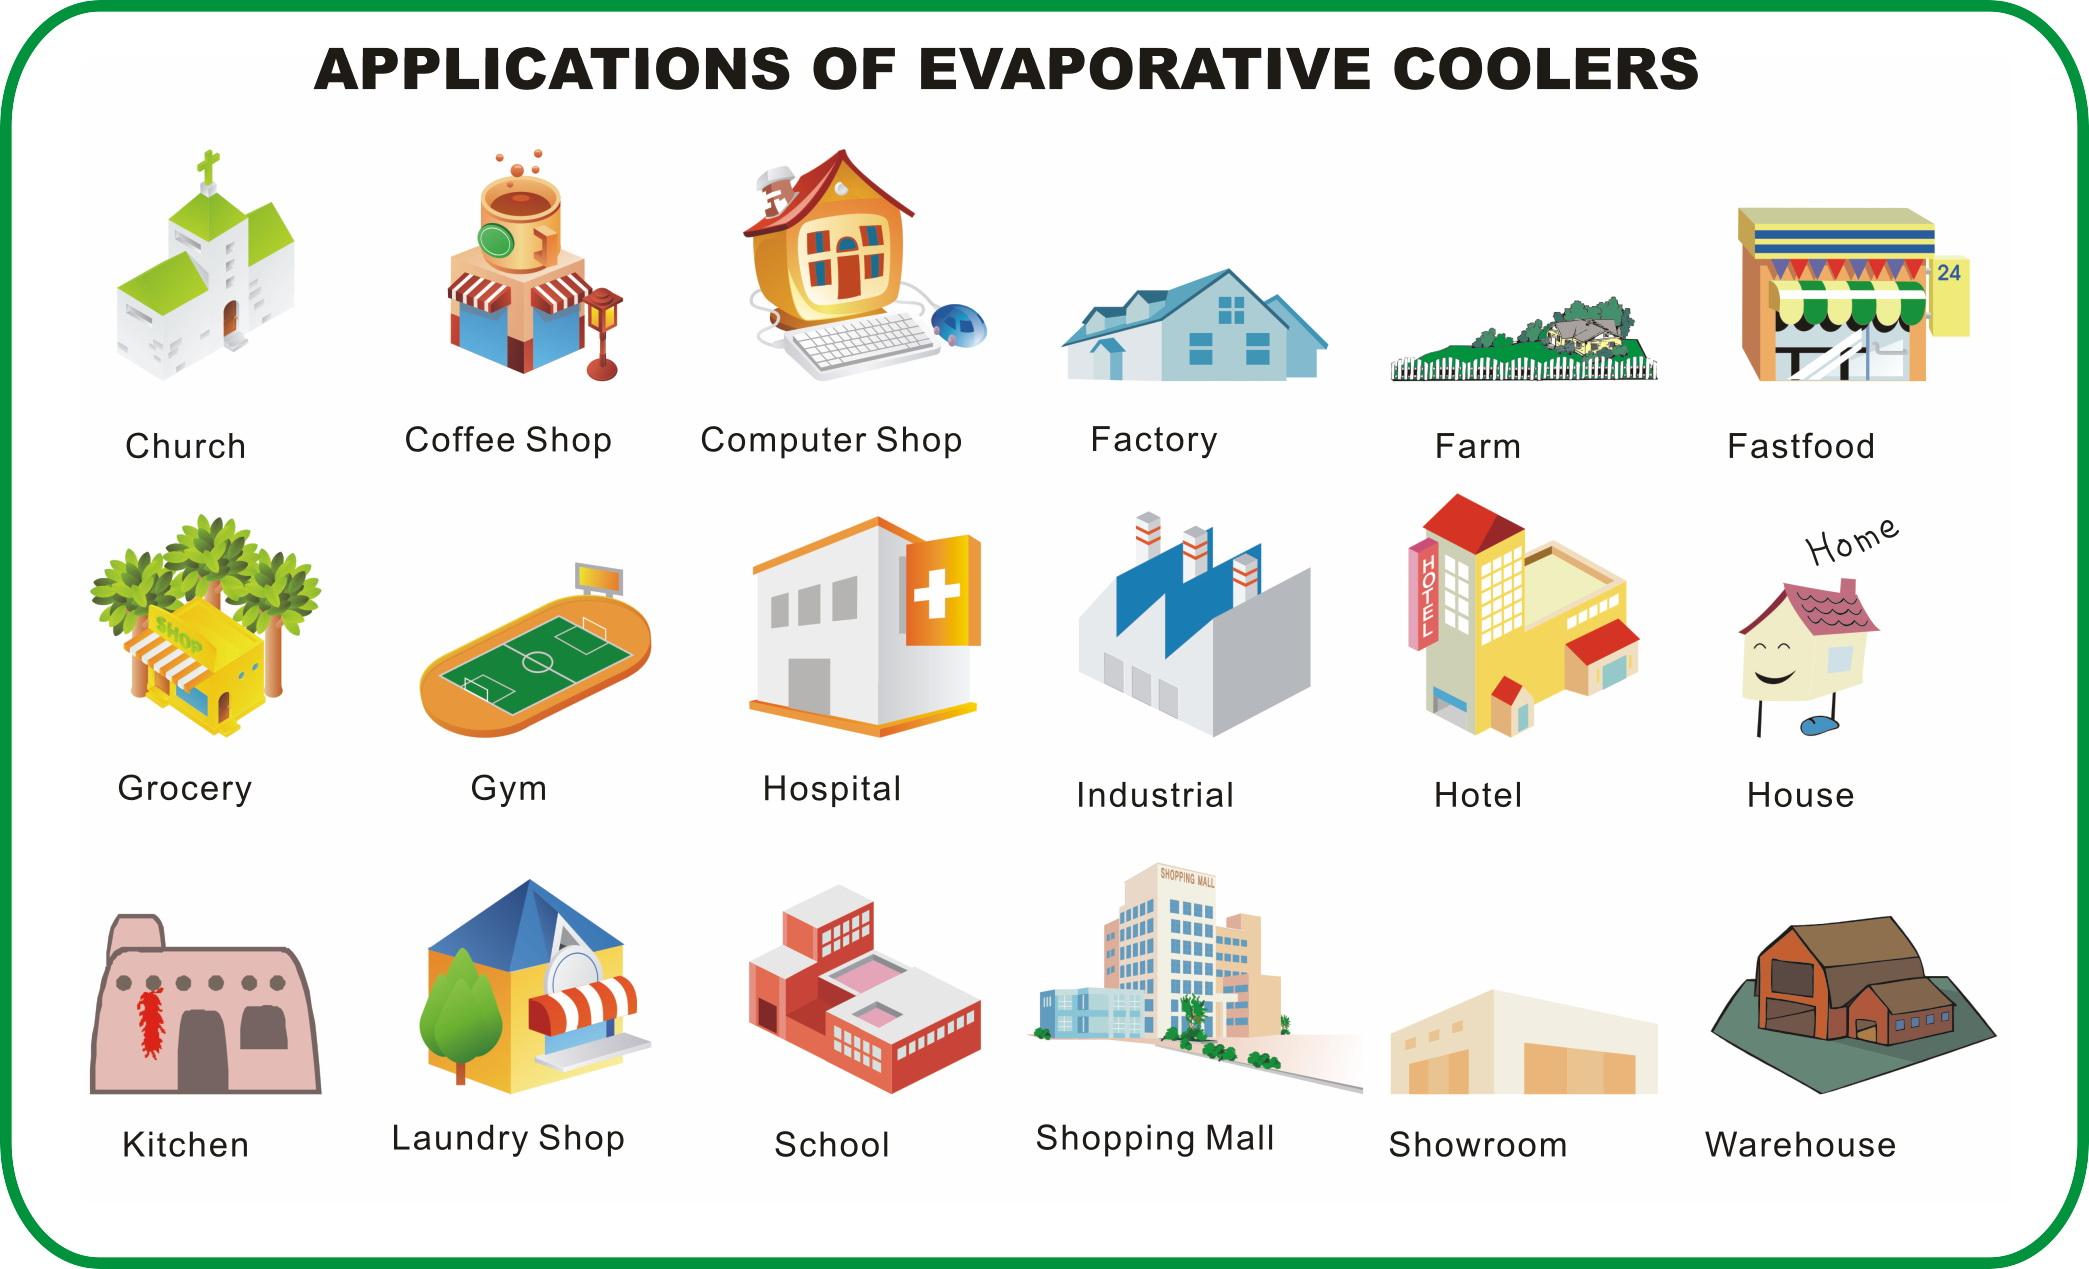 evaporative-cooling-applications.jpg